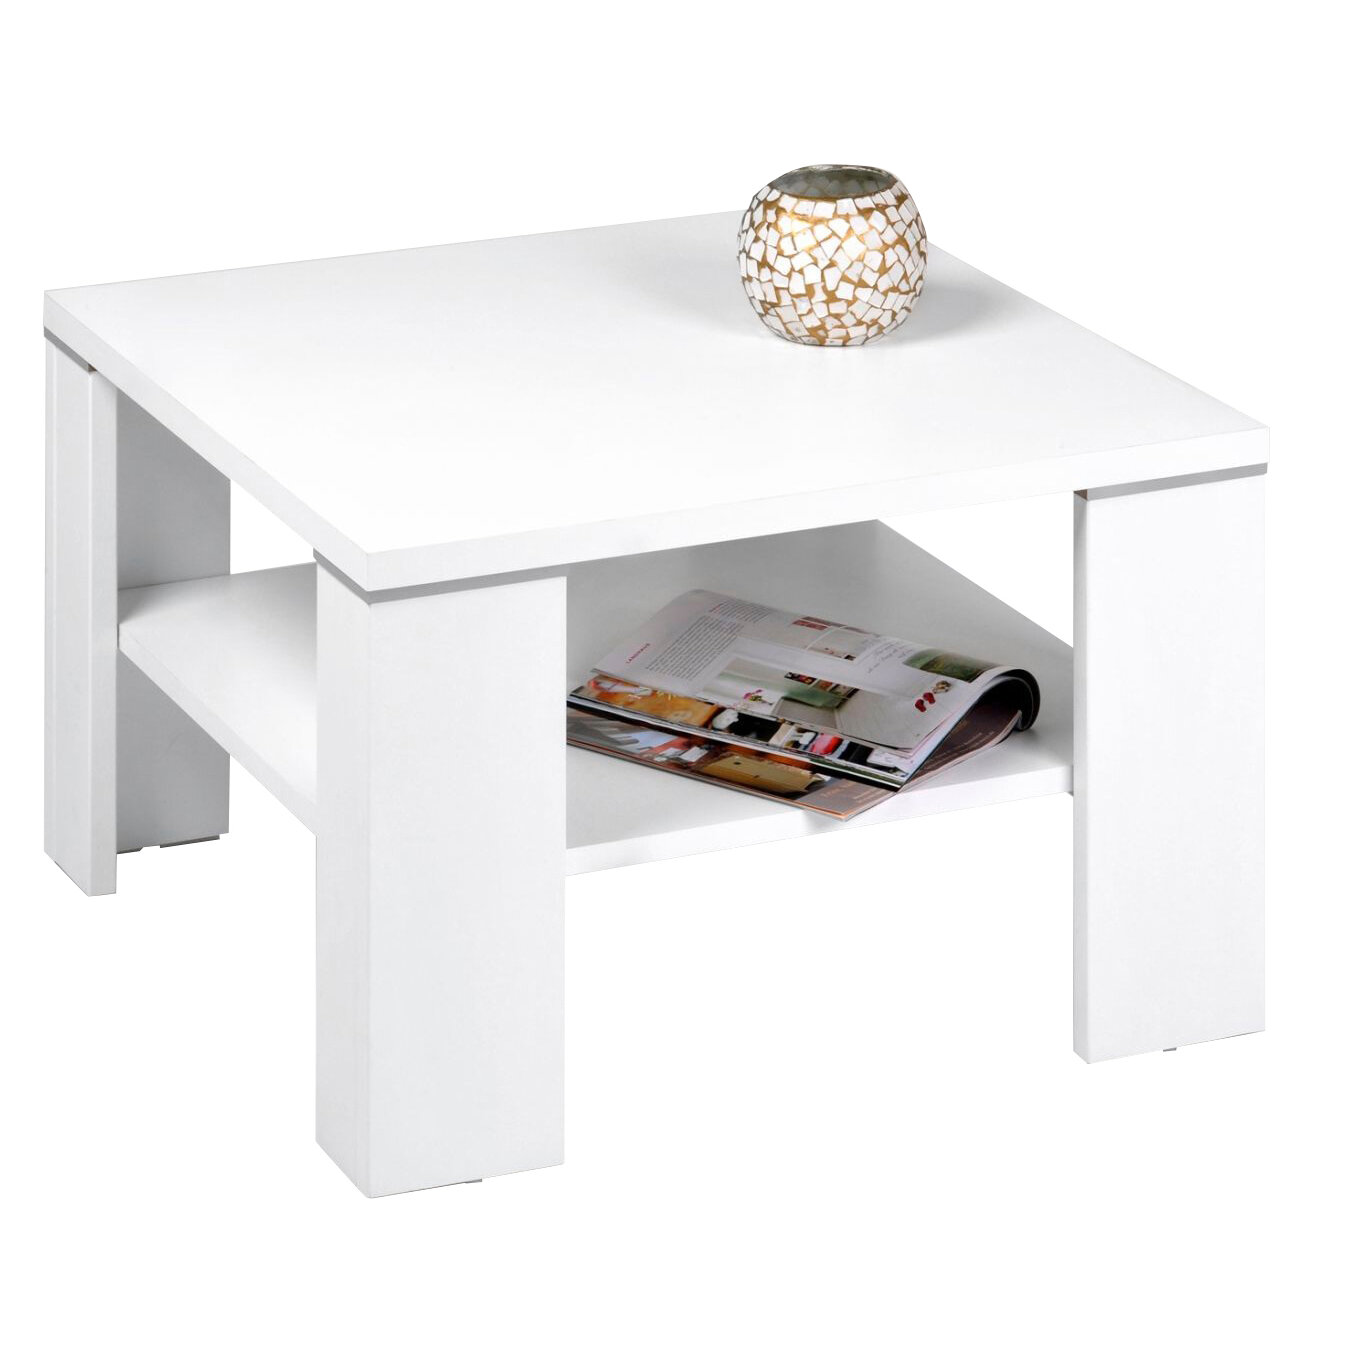 AlfaTische Santos Coffee Table With Storage Reviews Wayfaircouk - Santos coffee table